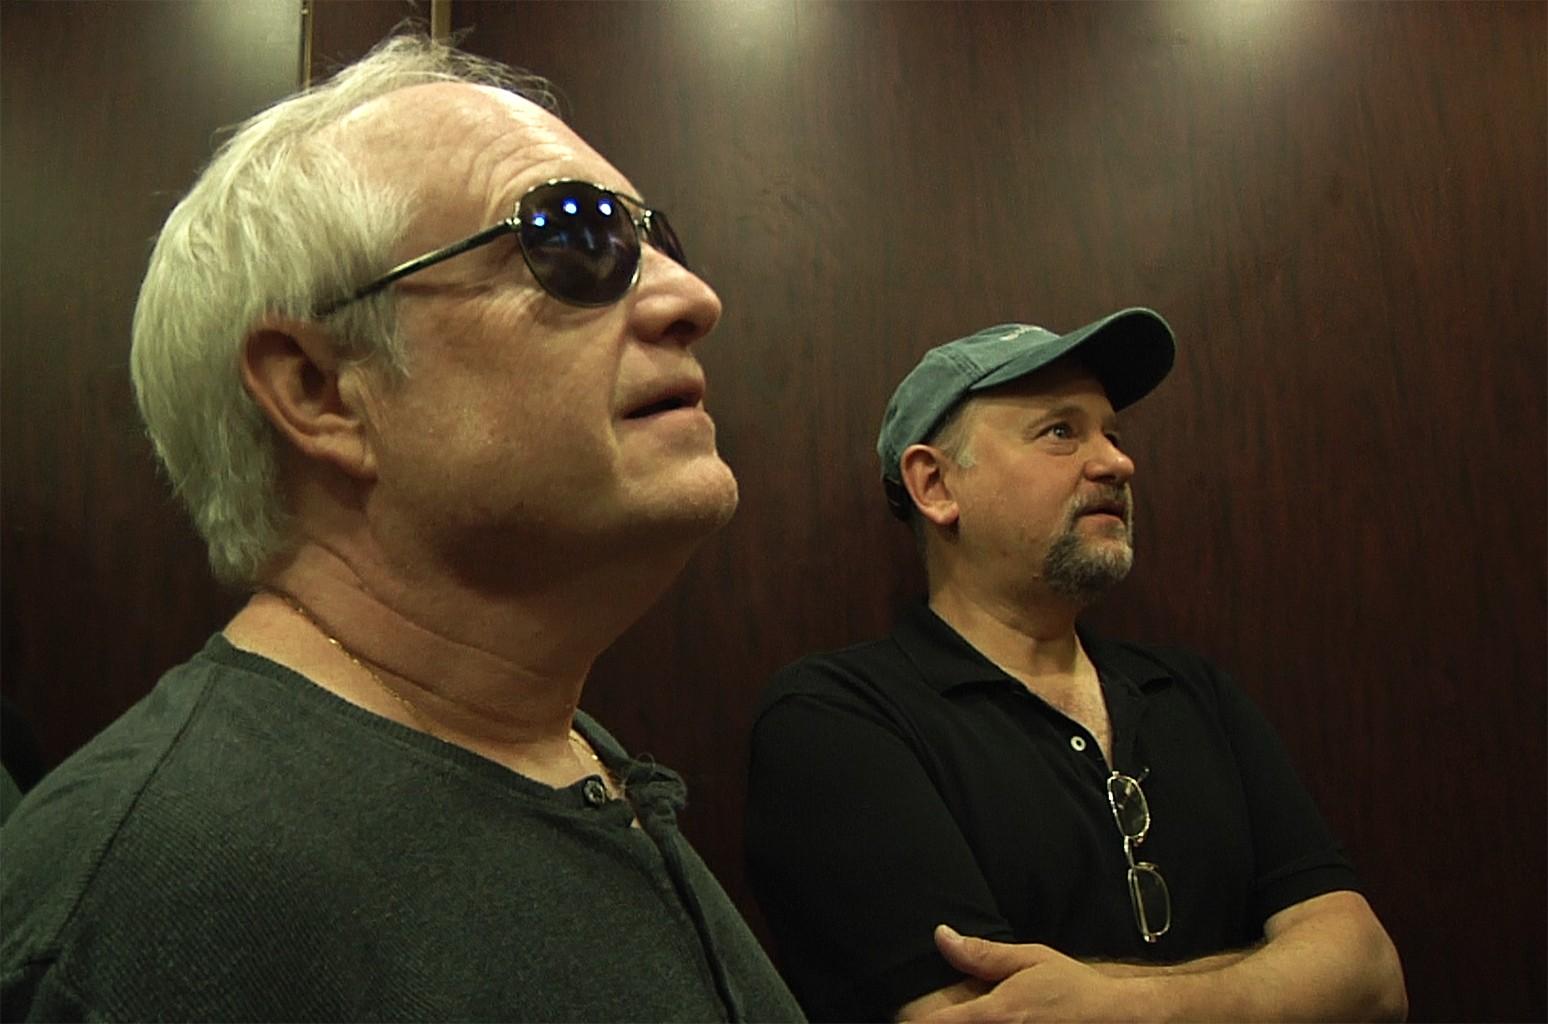 Denis McNamara and Mike Guidotti in Dare to Be Different